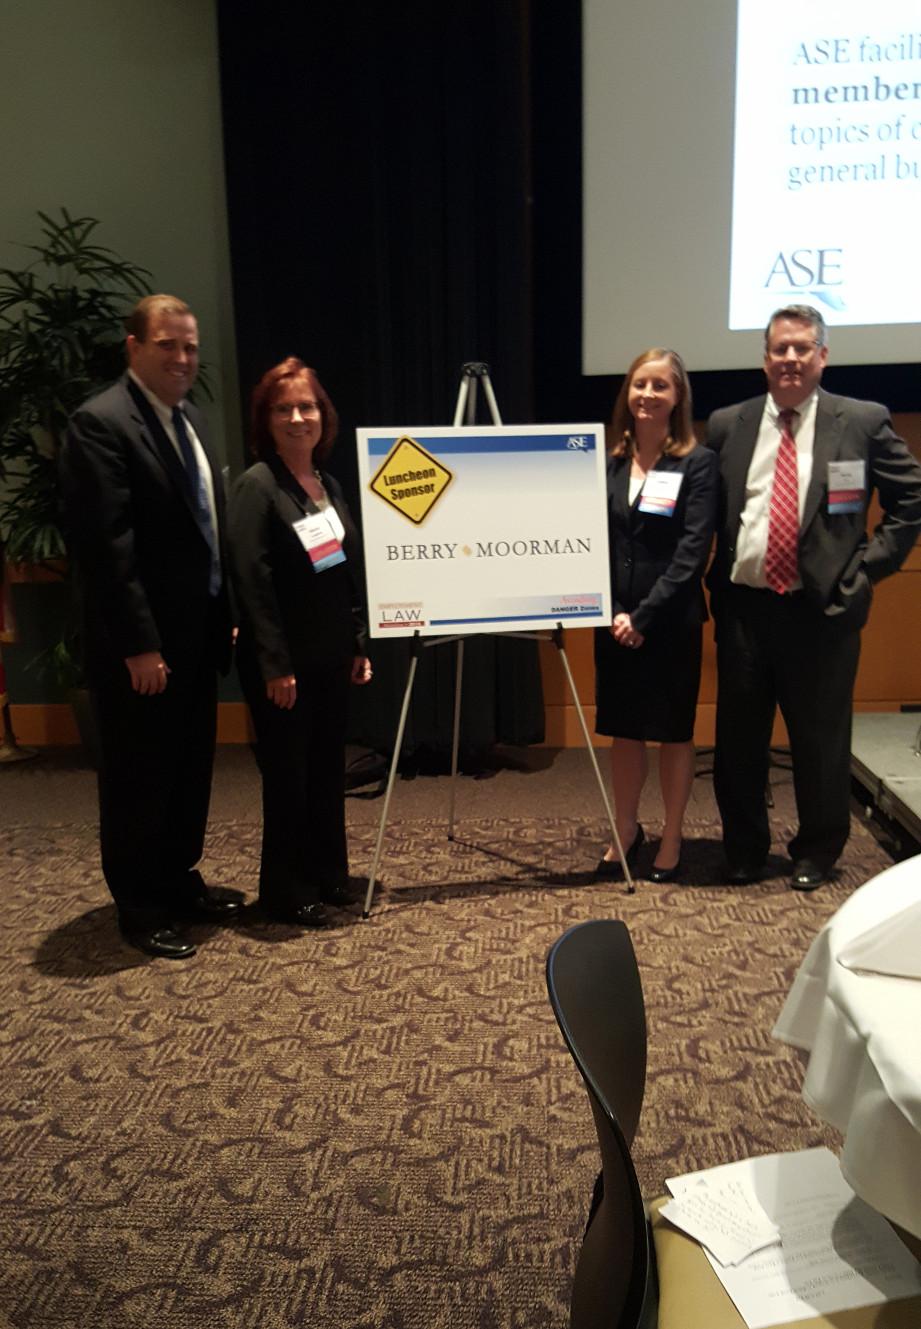 From left: Randy Barker, Sheryl Laughren, Andrea Pike, David Foy